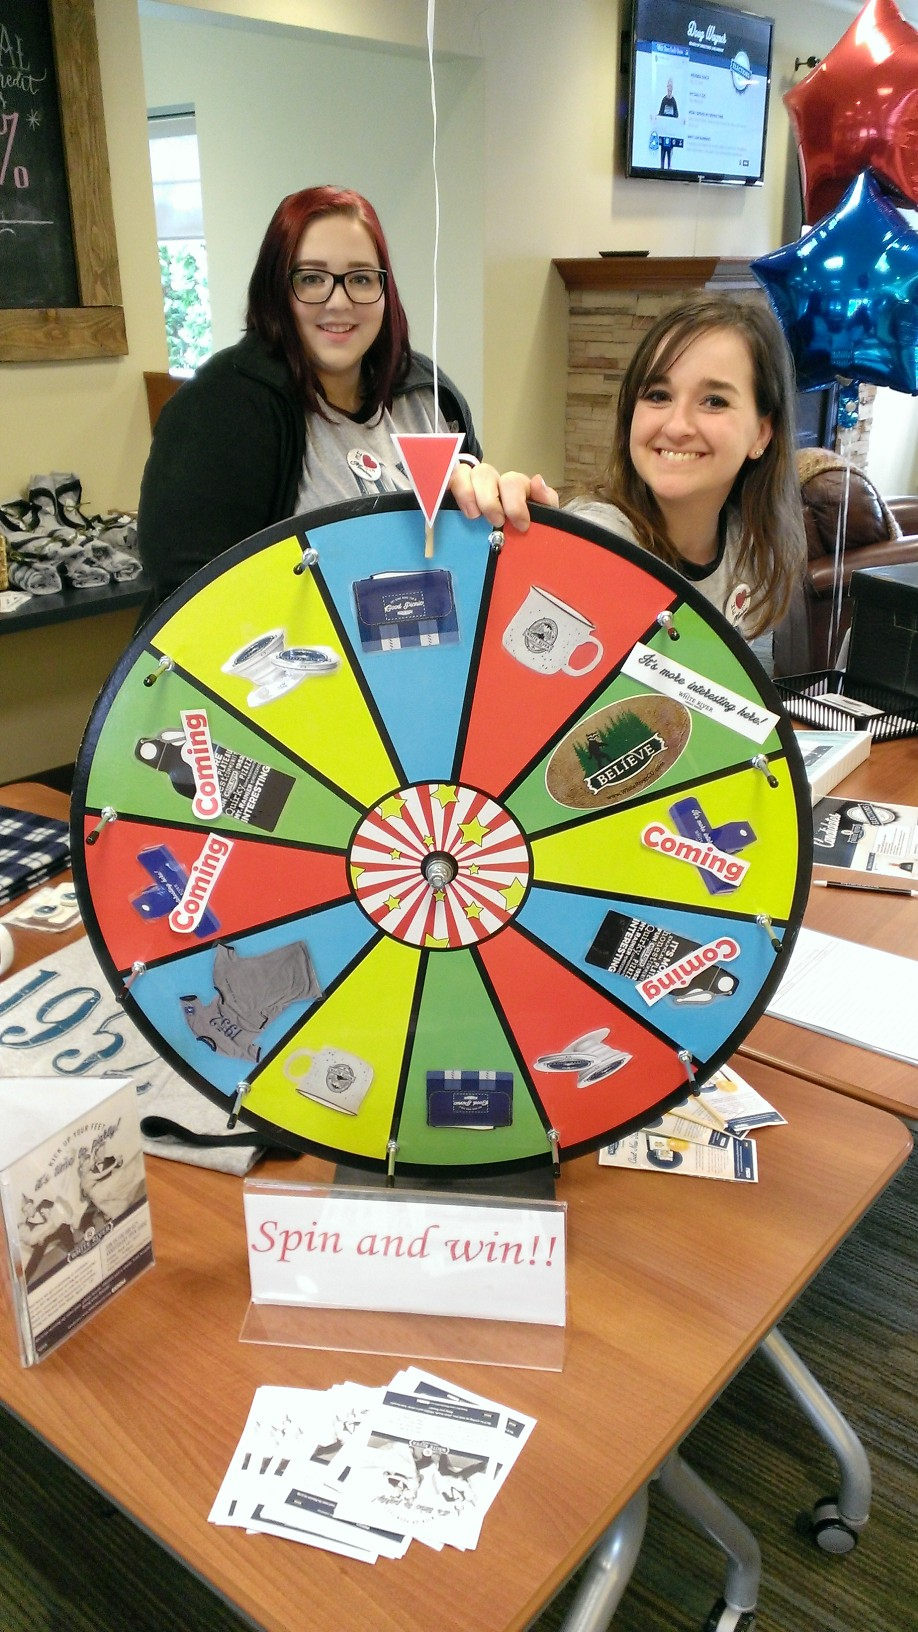 Spin and Win wheel inside WRCU